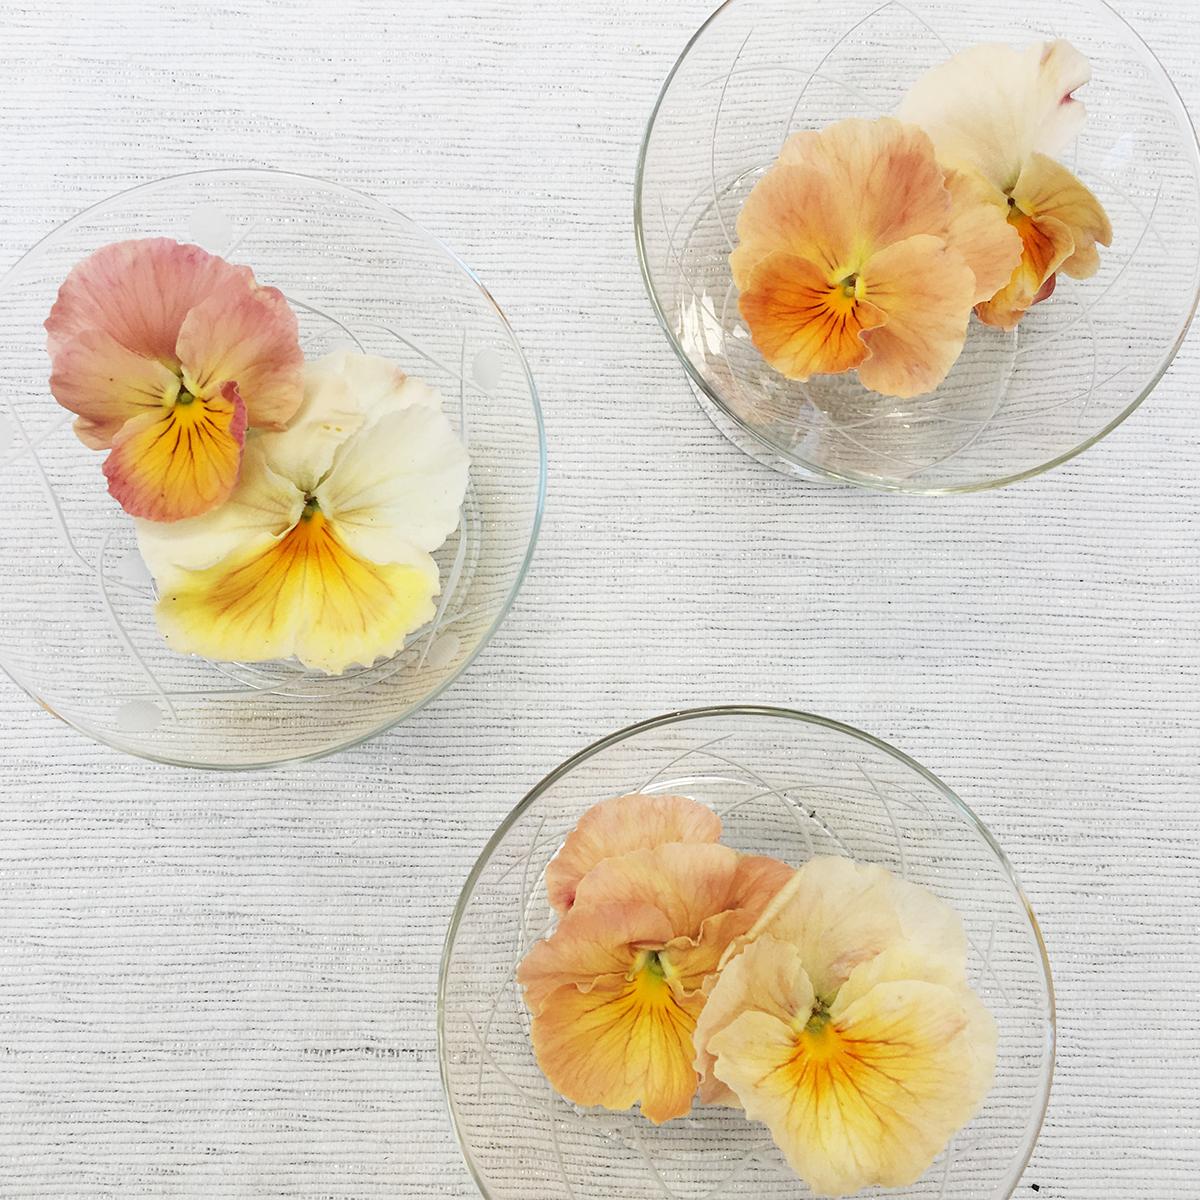 eetbarebloemen.jpg